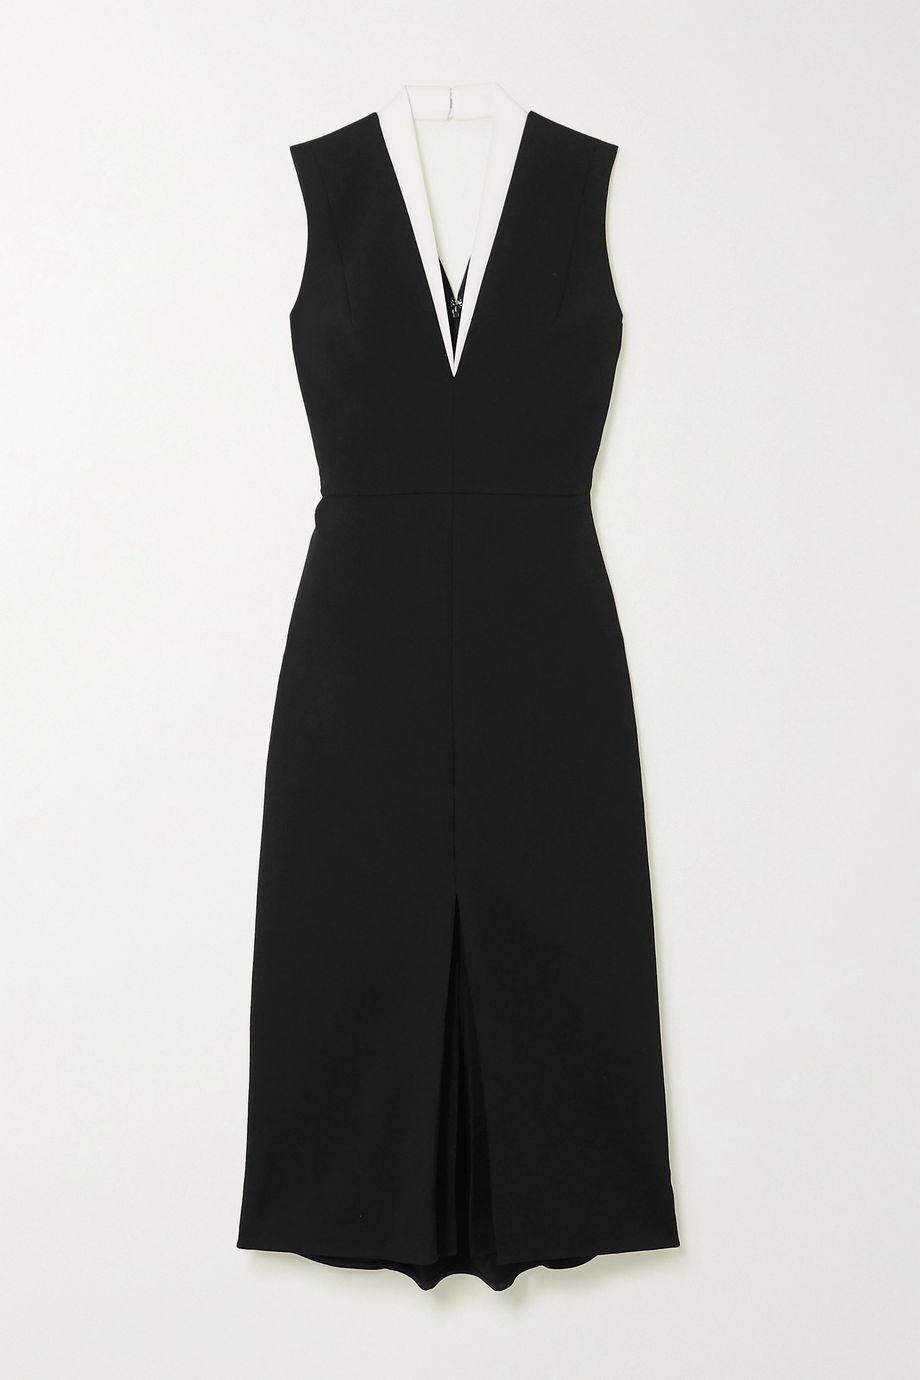 Victoria Beckham Cutout two-tone crepe dress